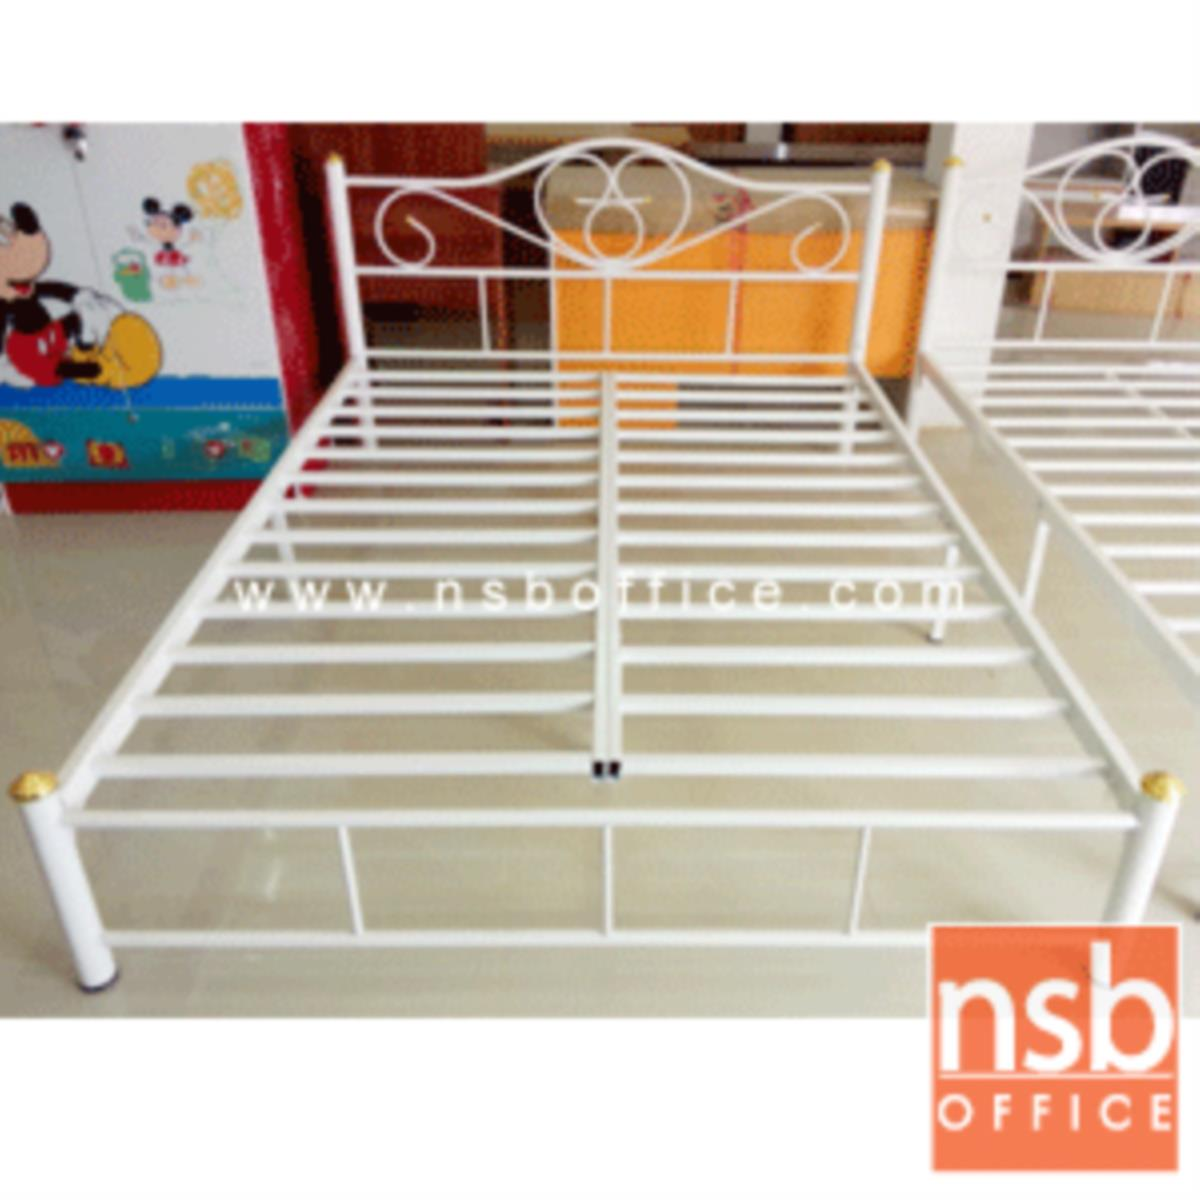 G11A016:เตียงเหล็ก 6 ฟุต รุ่นมาตรฐาน หนา 0.7 mm. ขนาด 182.88W* 200D* 33H cm (ลายบัว)